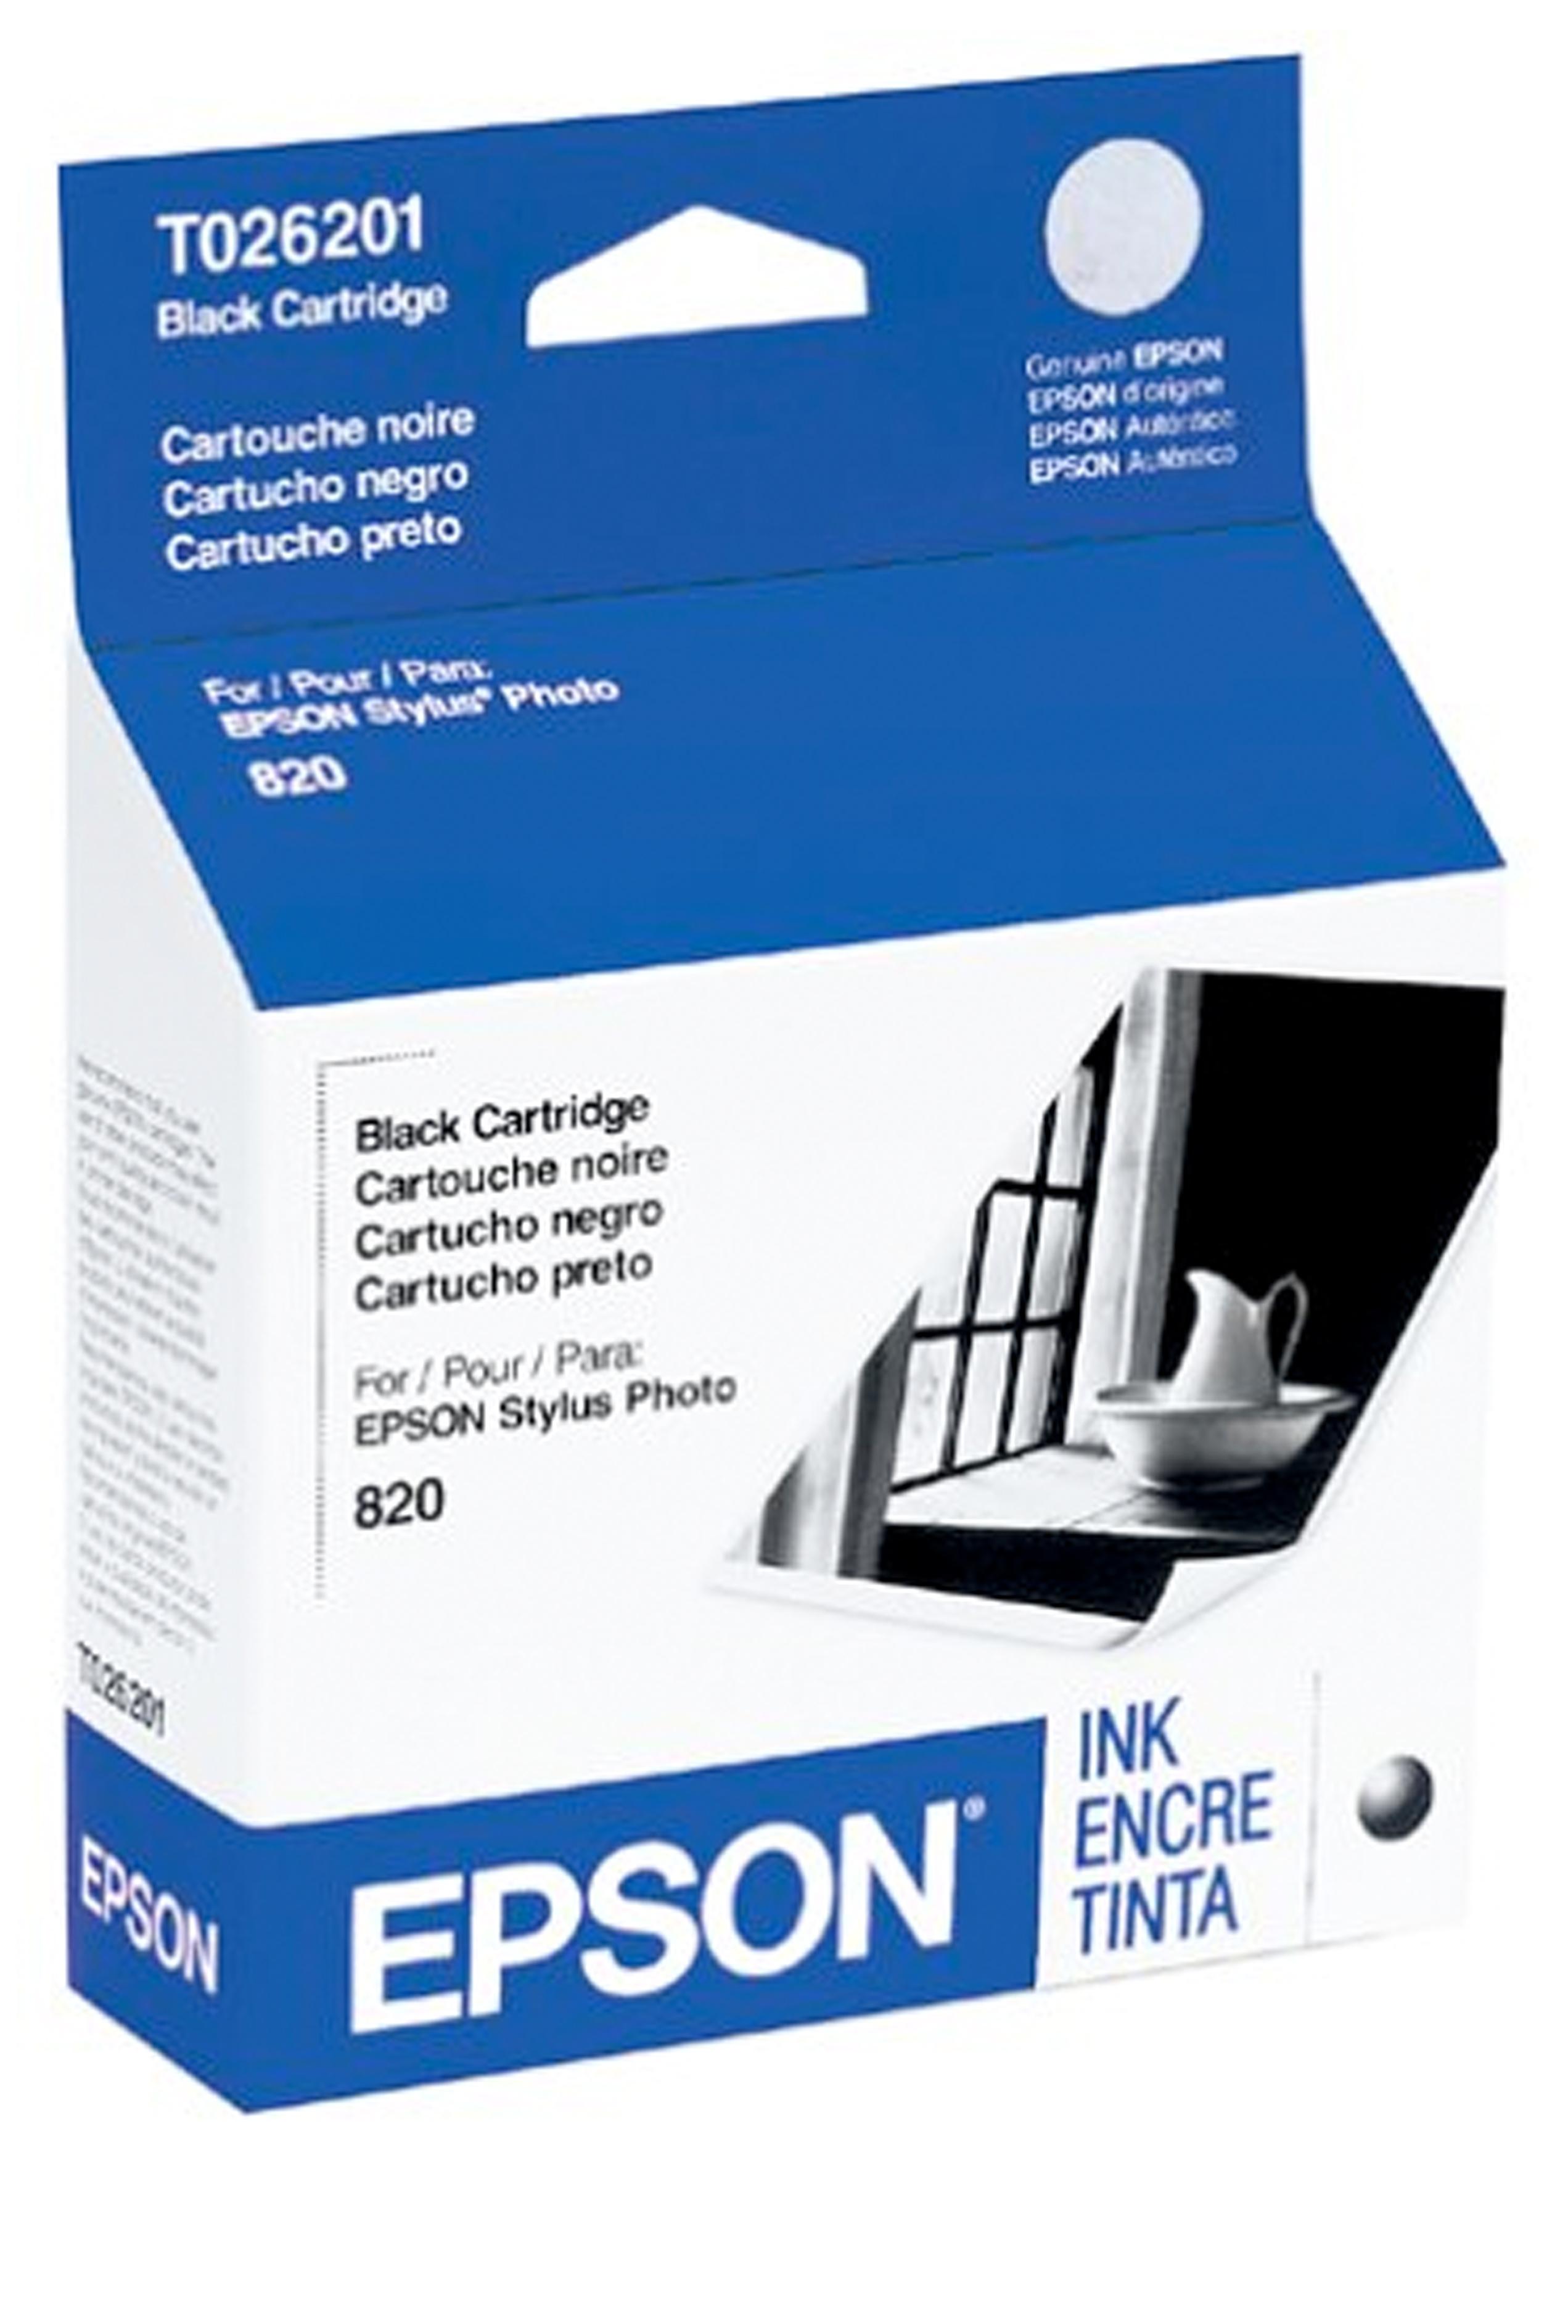 Epson EPSON SD BLACK INK (500) (T026201)